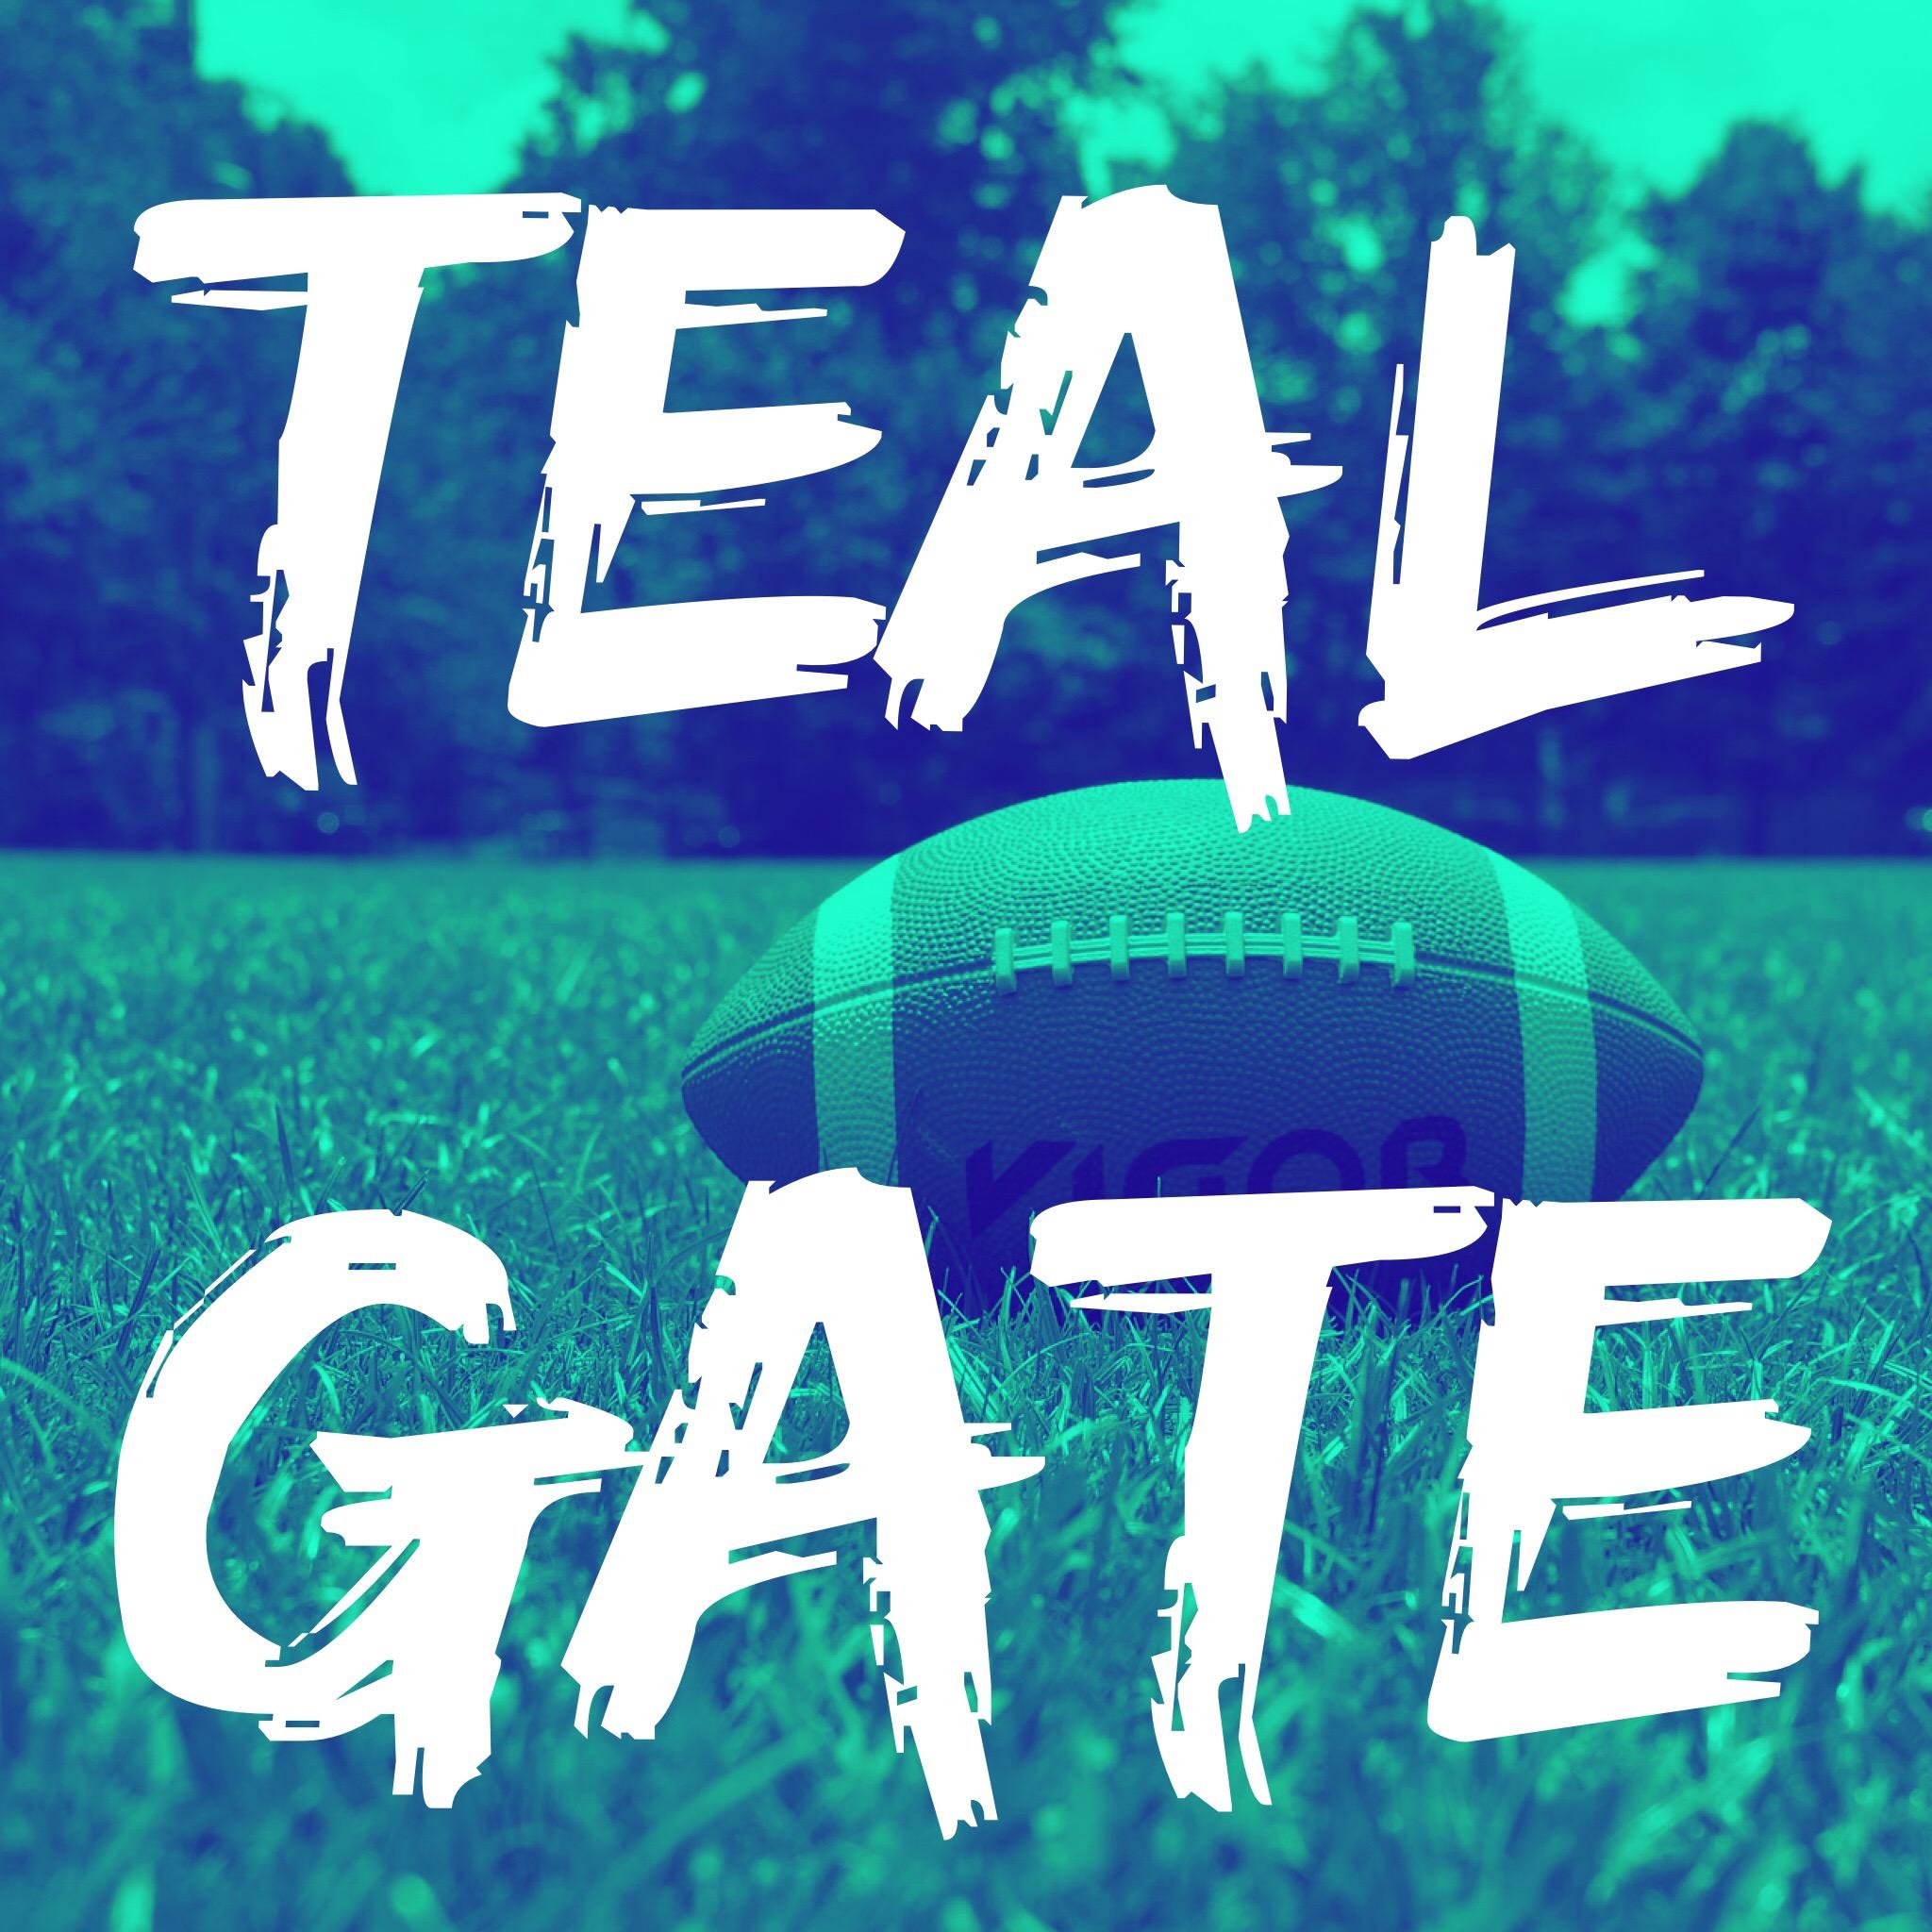 Teal Gate